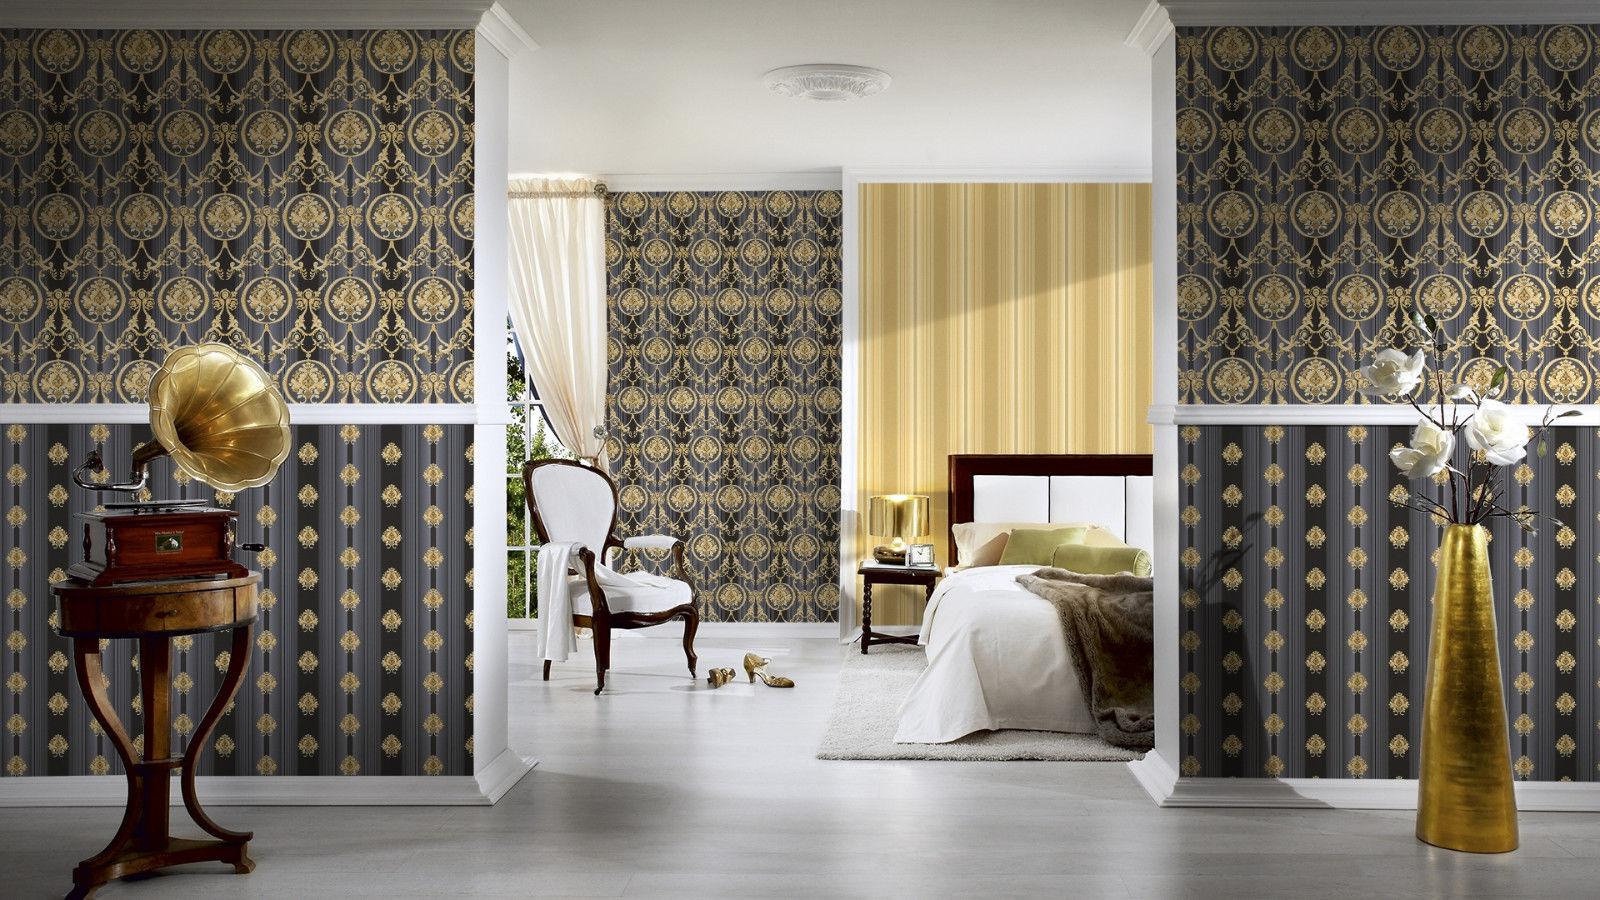 Luxus vlies tapete barock muster ornament schwarz gold for Tapete schwarz muster